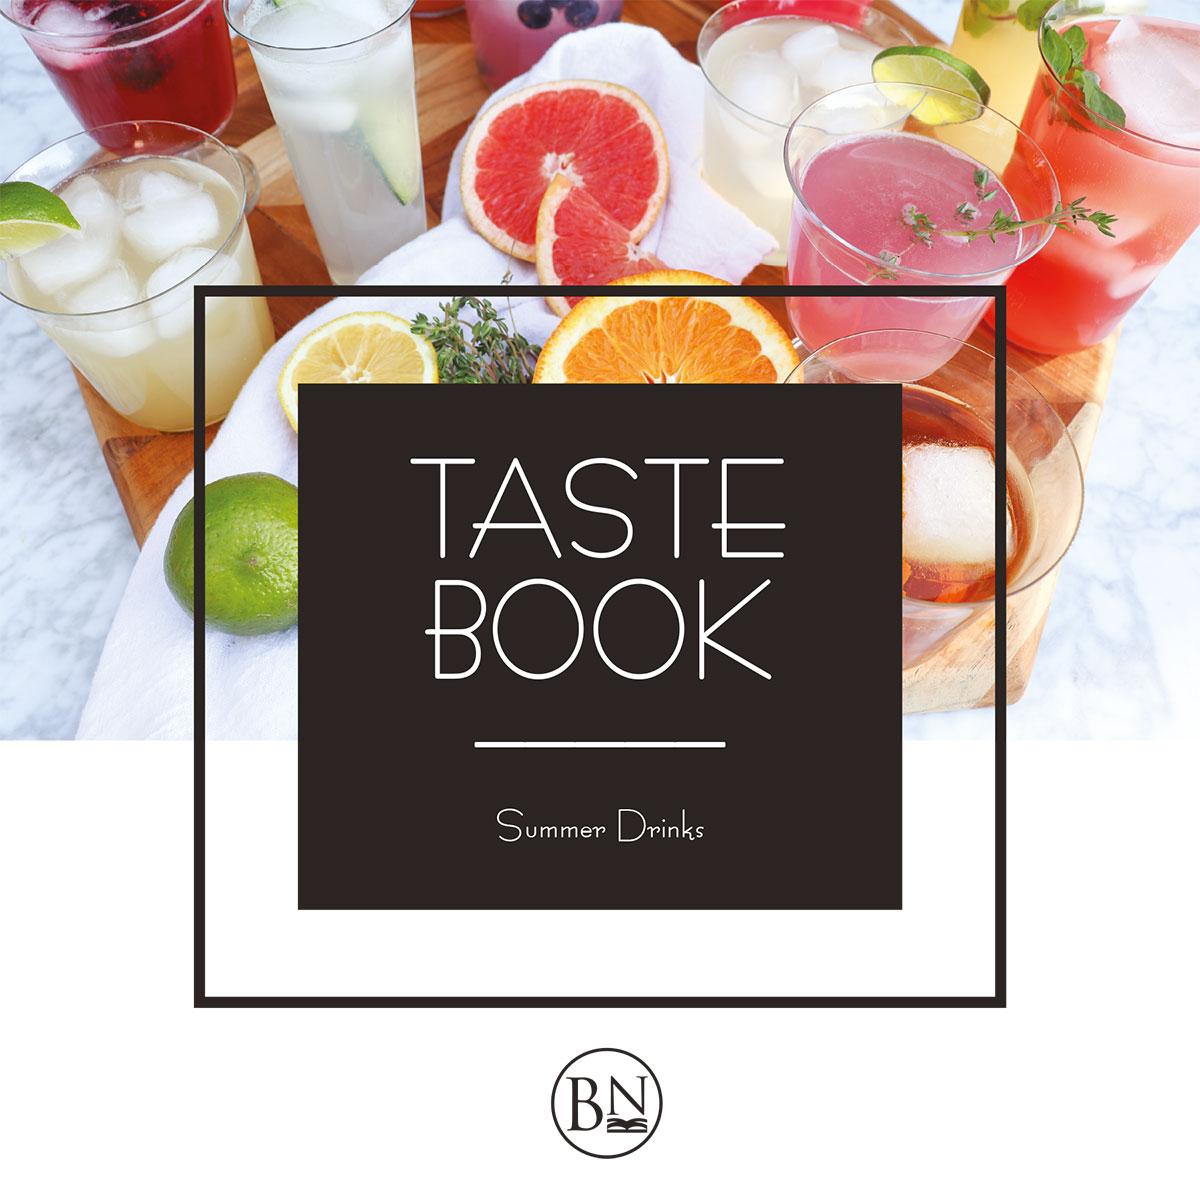 Taste Book Summer Drinks